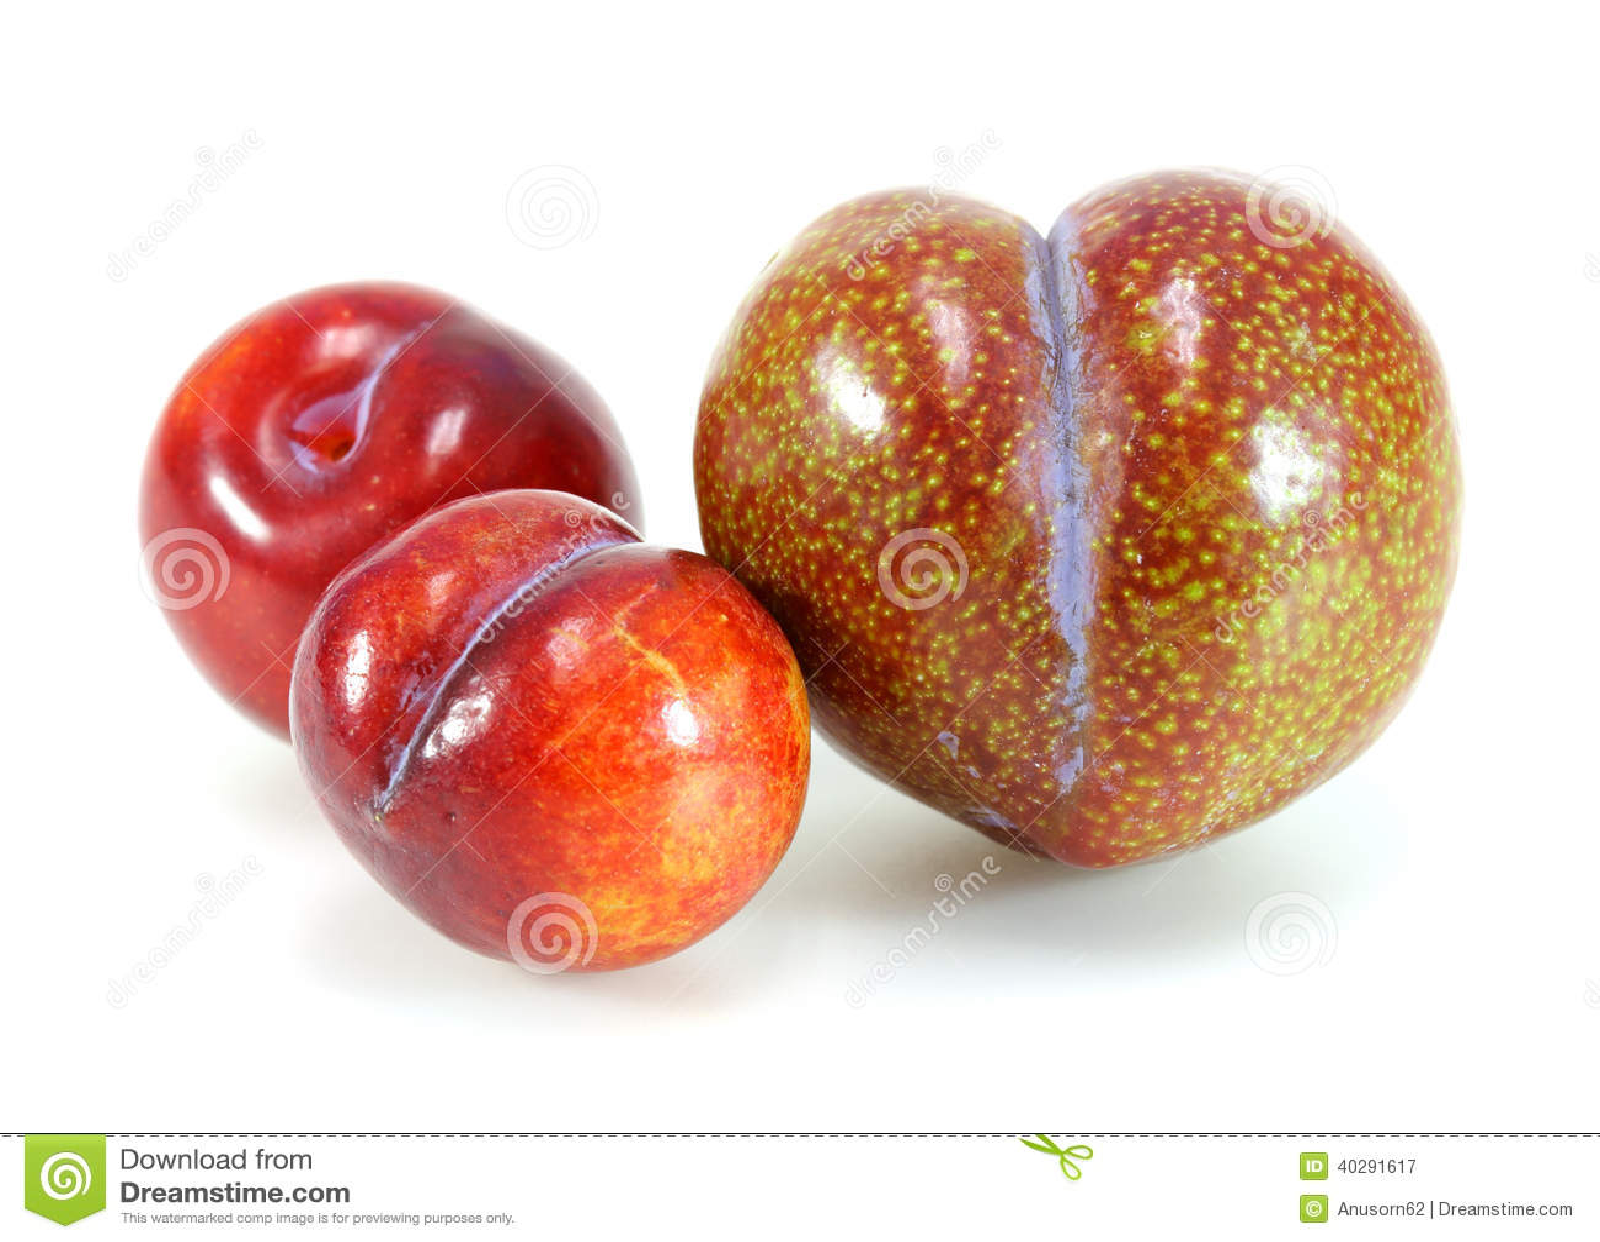 Red plum fruit stock image. Image of food, ingredient